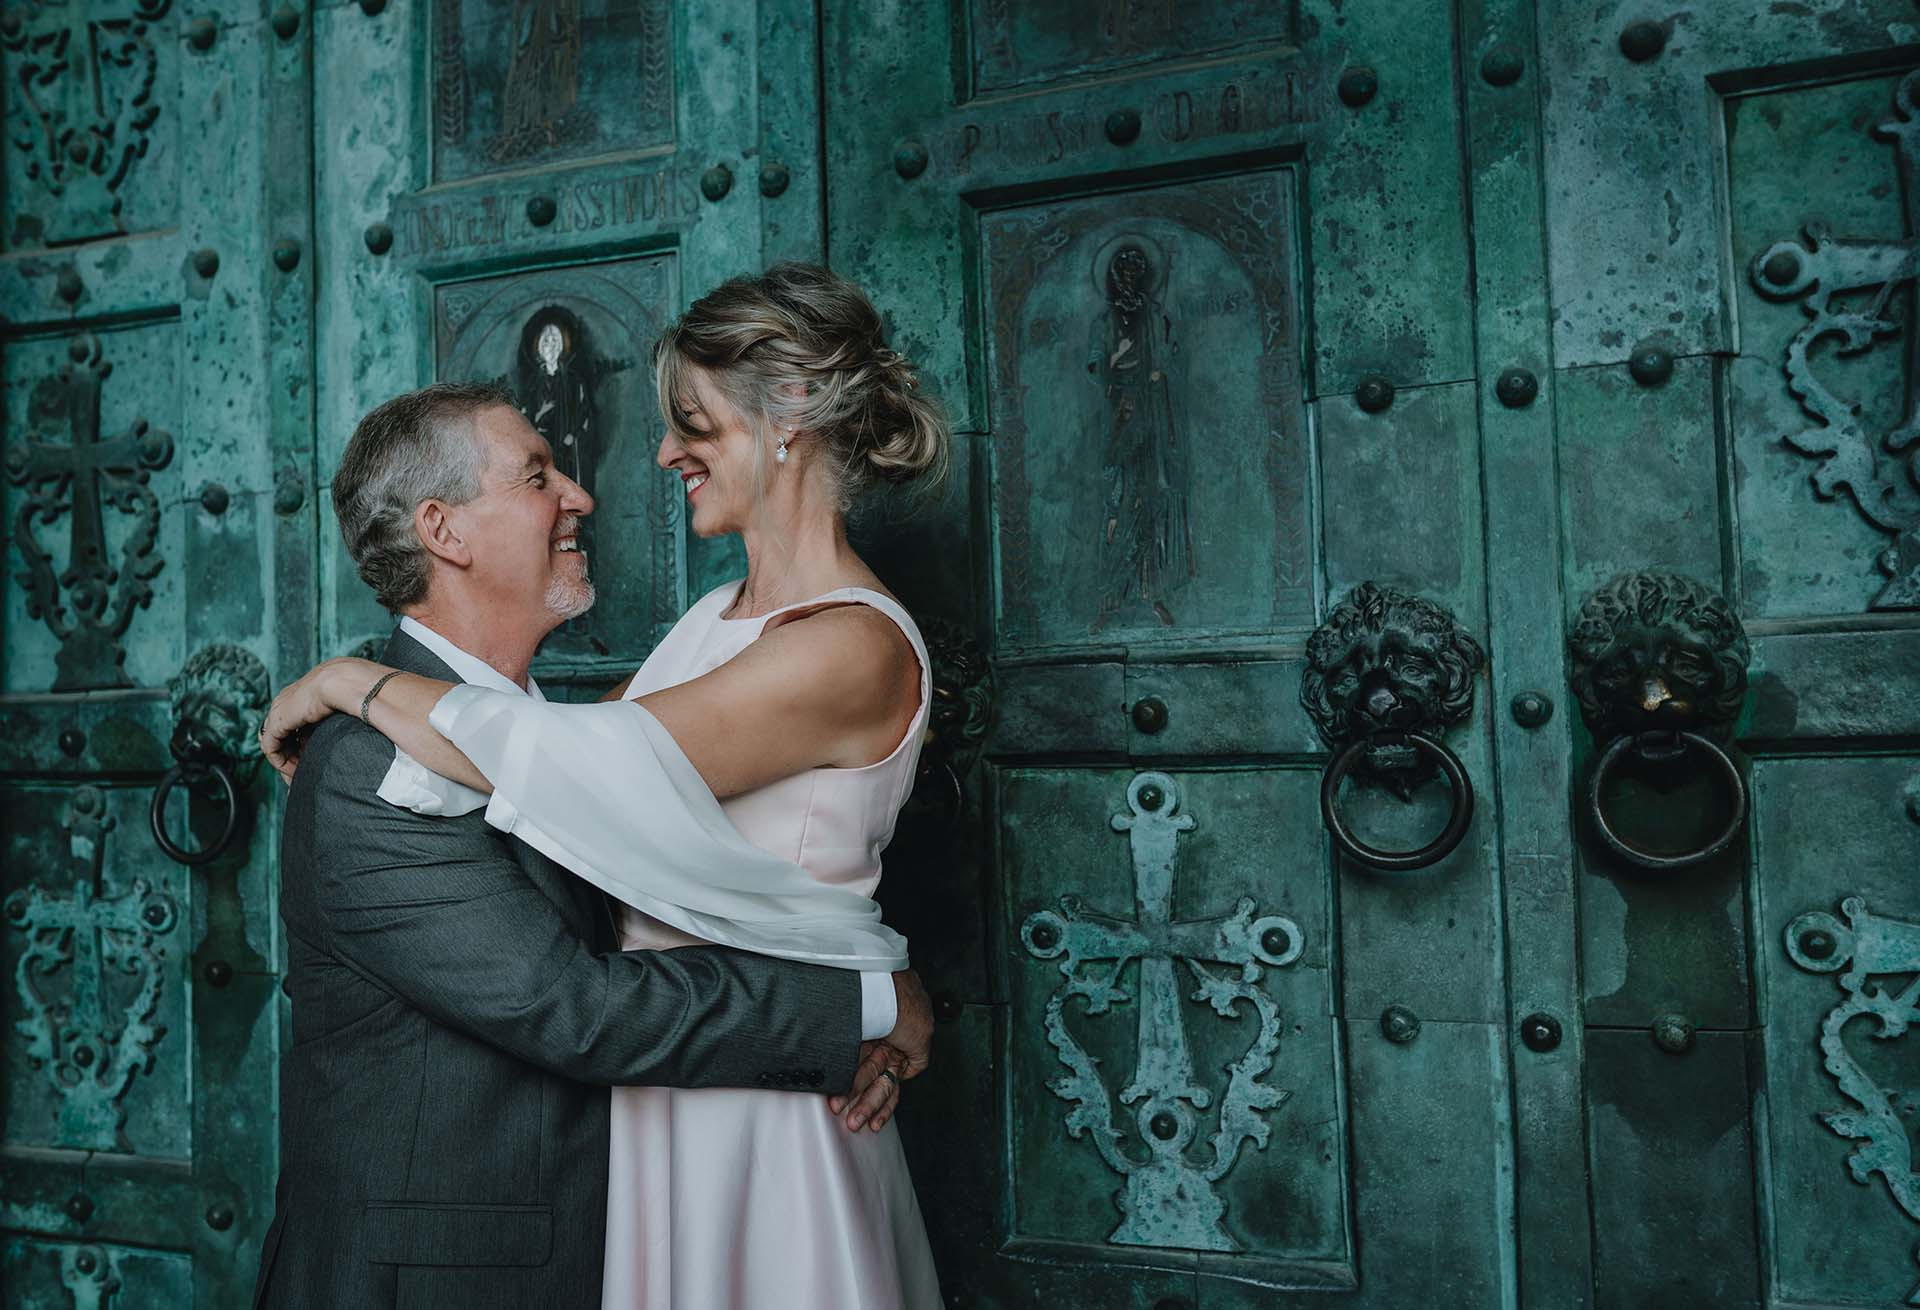 matrimonio costiera amalfitana (6)